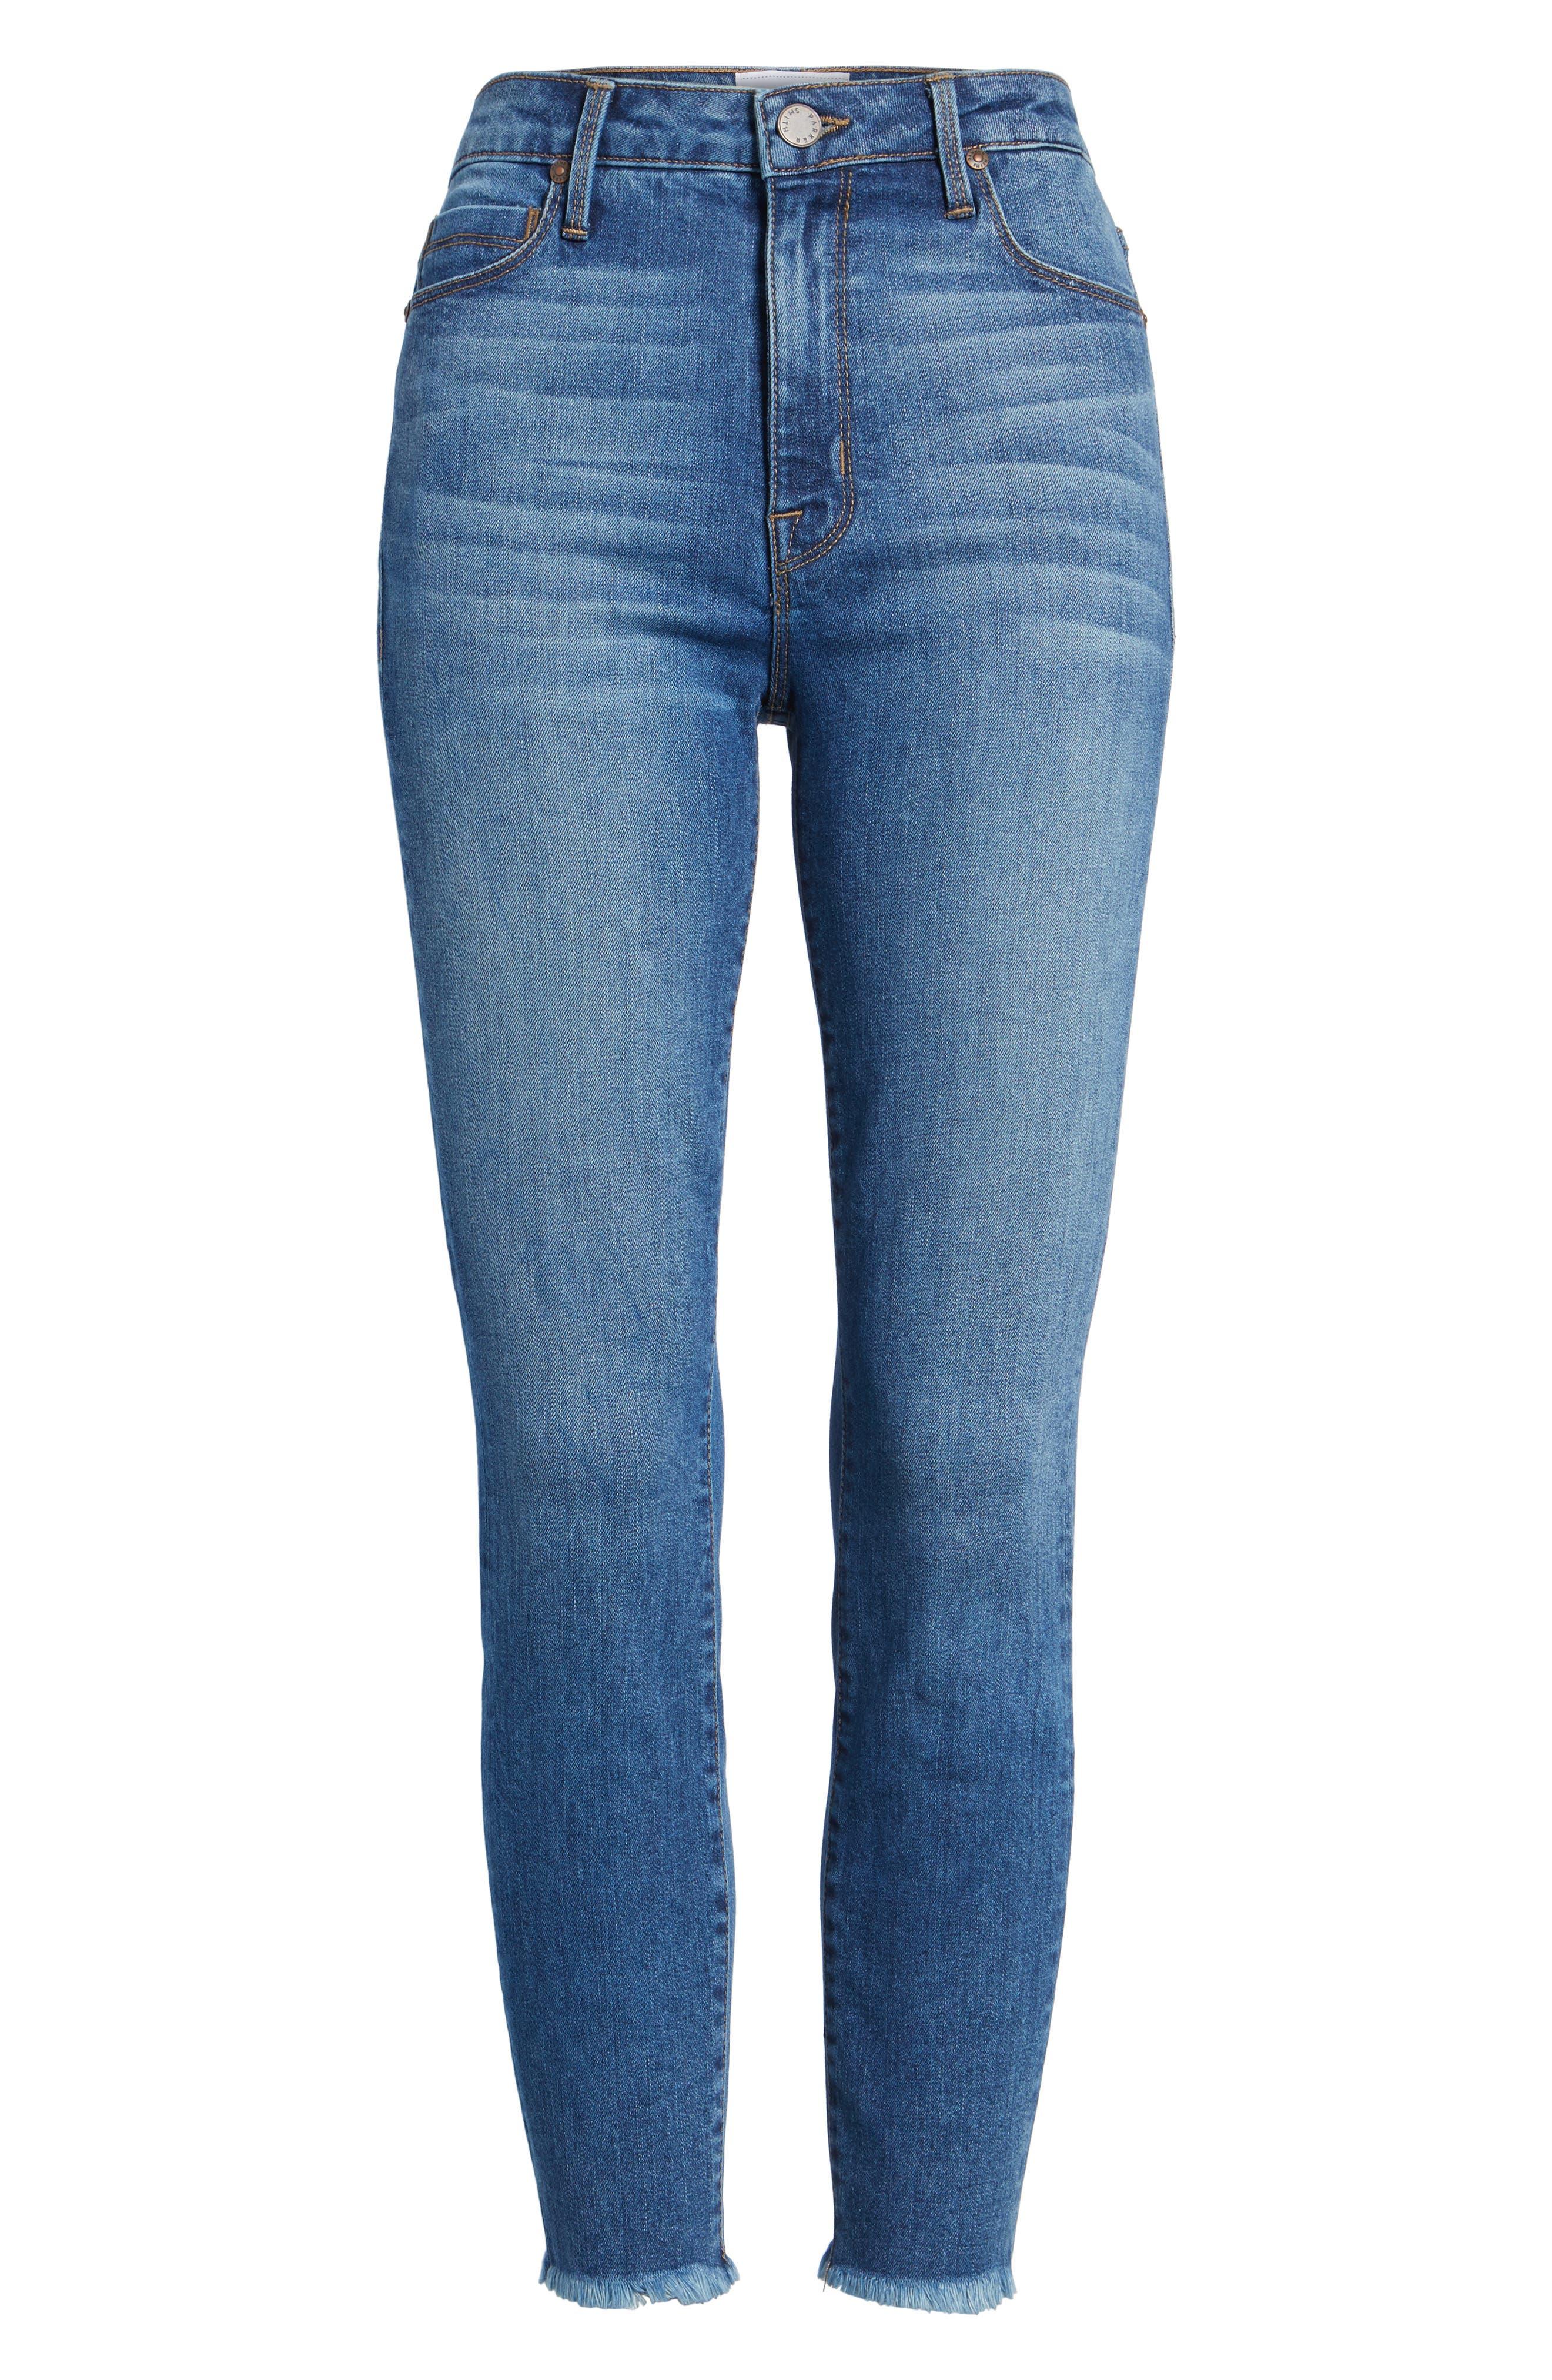 Bombshell Raw Hem Stretch Skinny Jeans,                             Alternate thumbnail 7, color,                             426